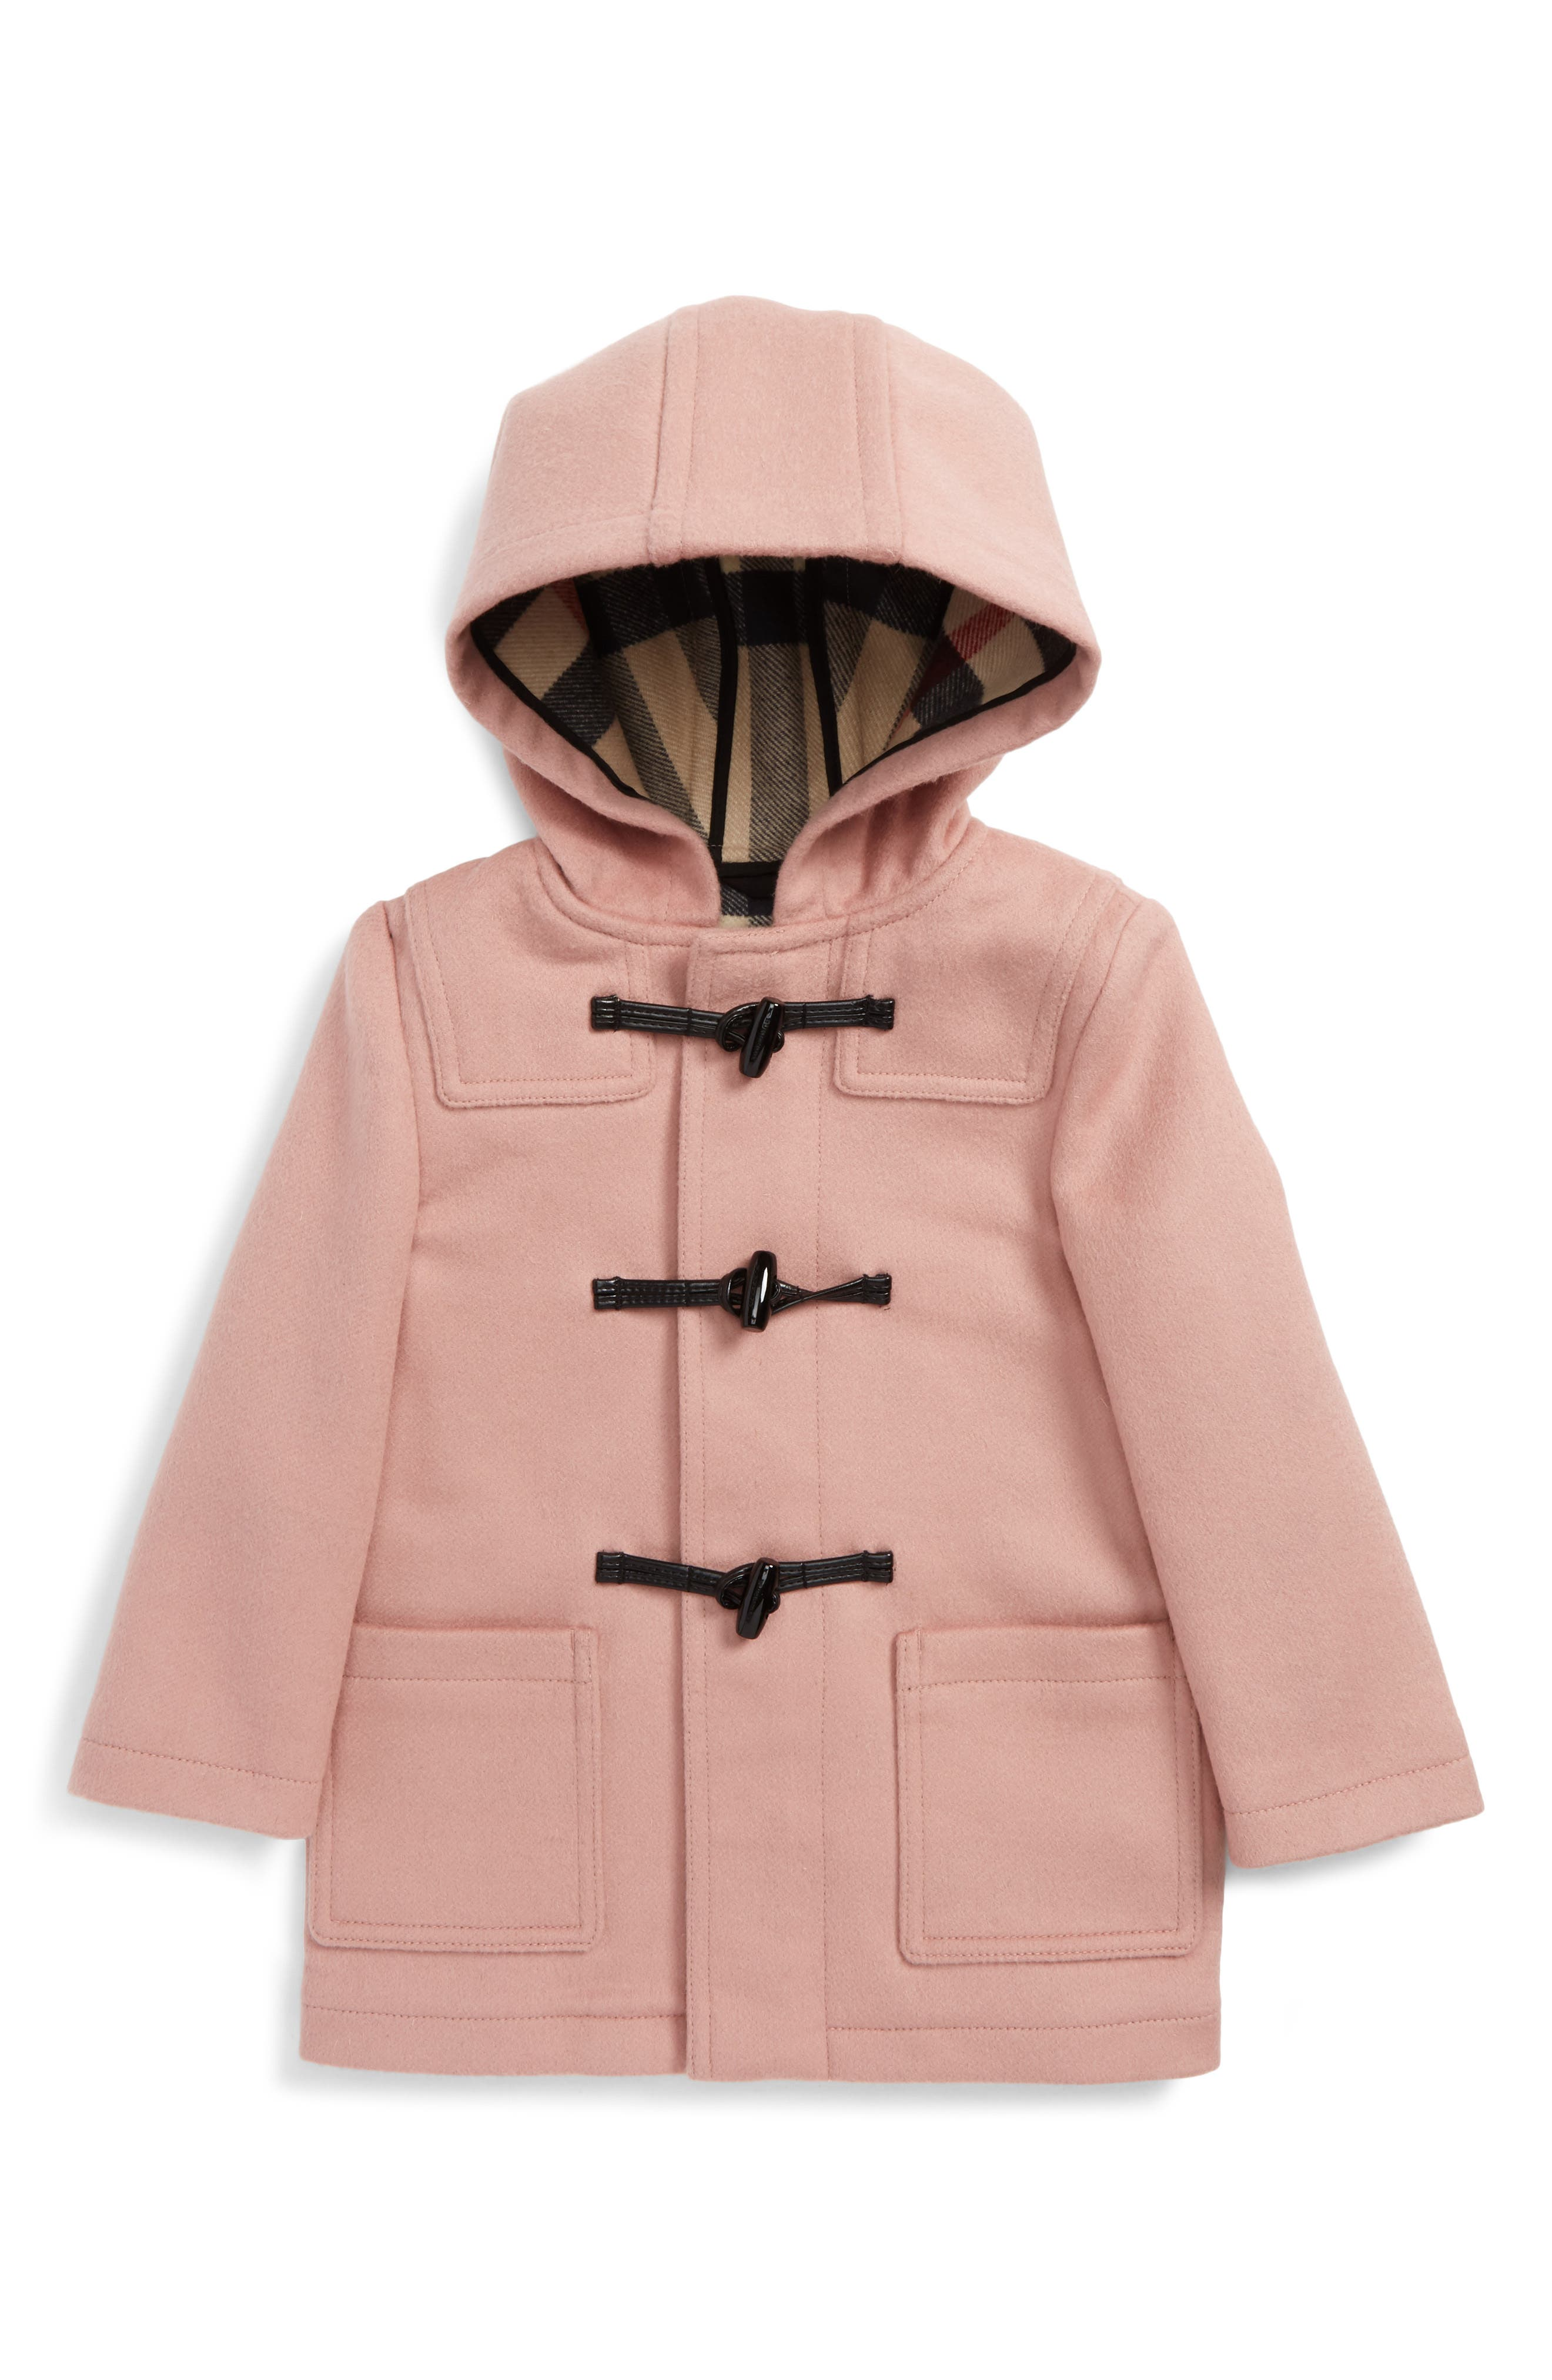 Alternate Image 1 Selected - Burberry Brogan Hooded Wool Toggle Coat (Baby Girls & Toddler Girls)